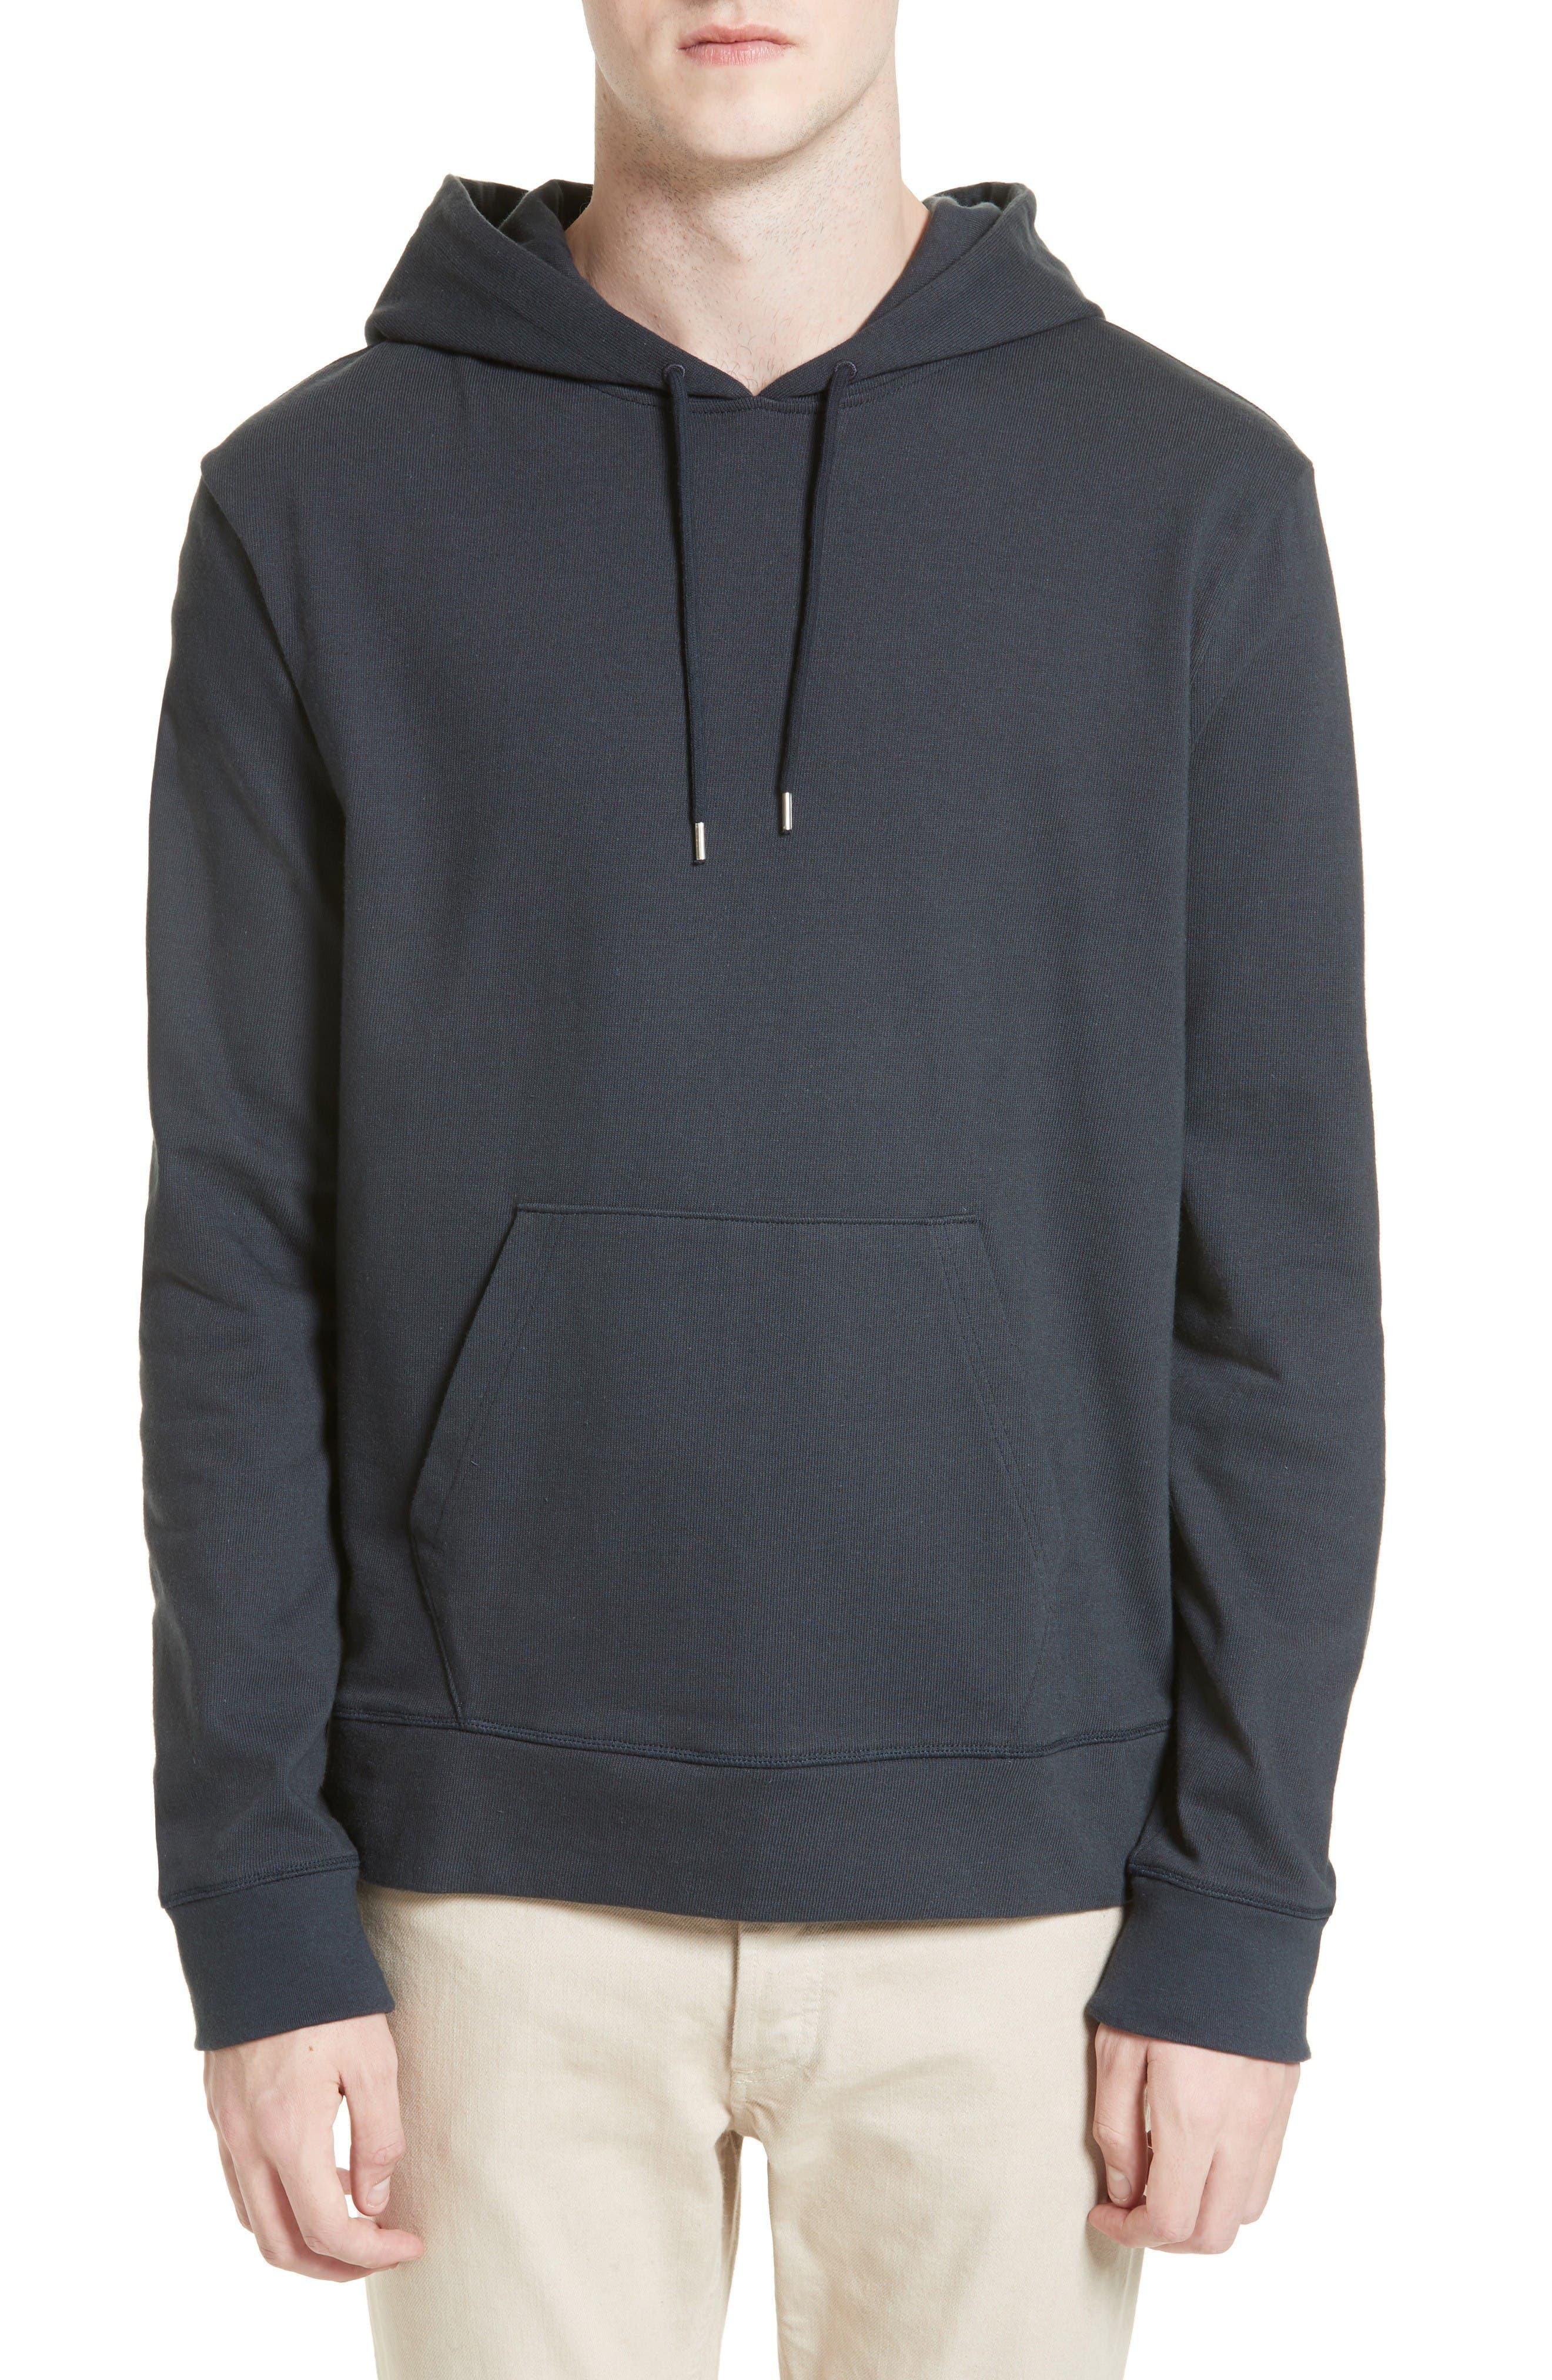 Main Image - A.P.C. Brody Hooded Sweatshirt